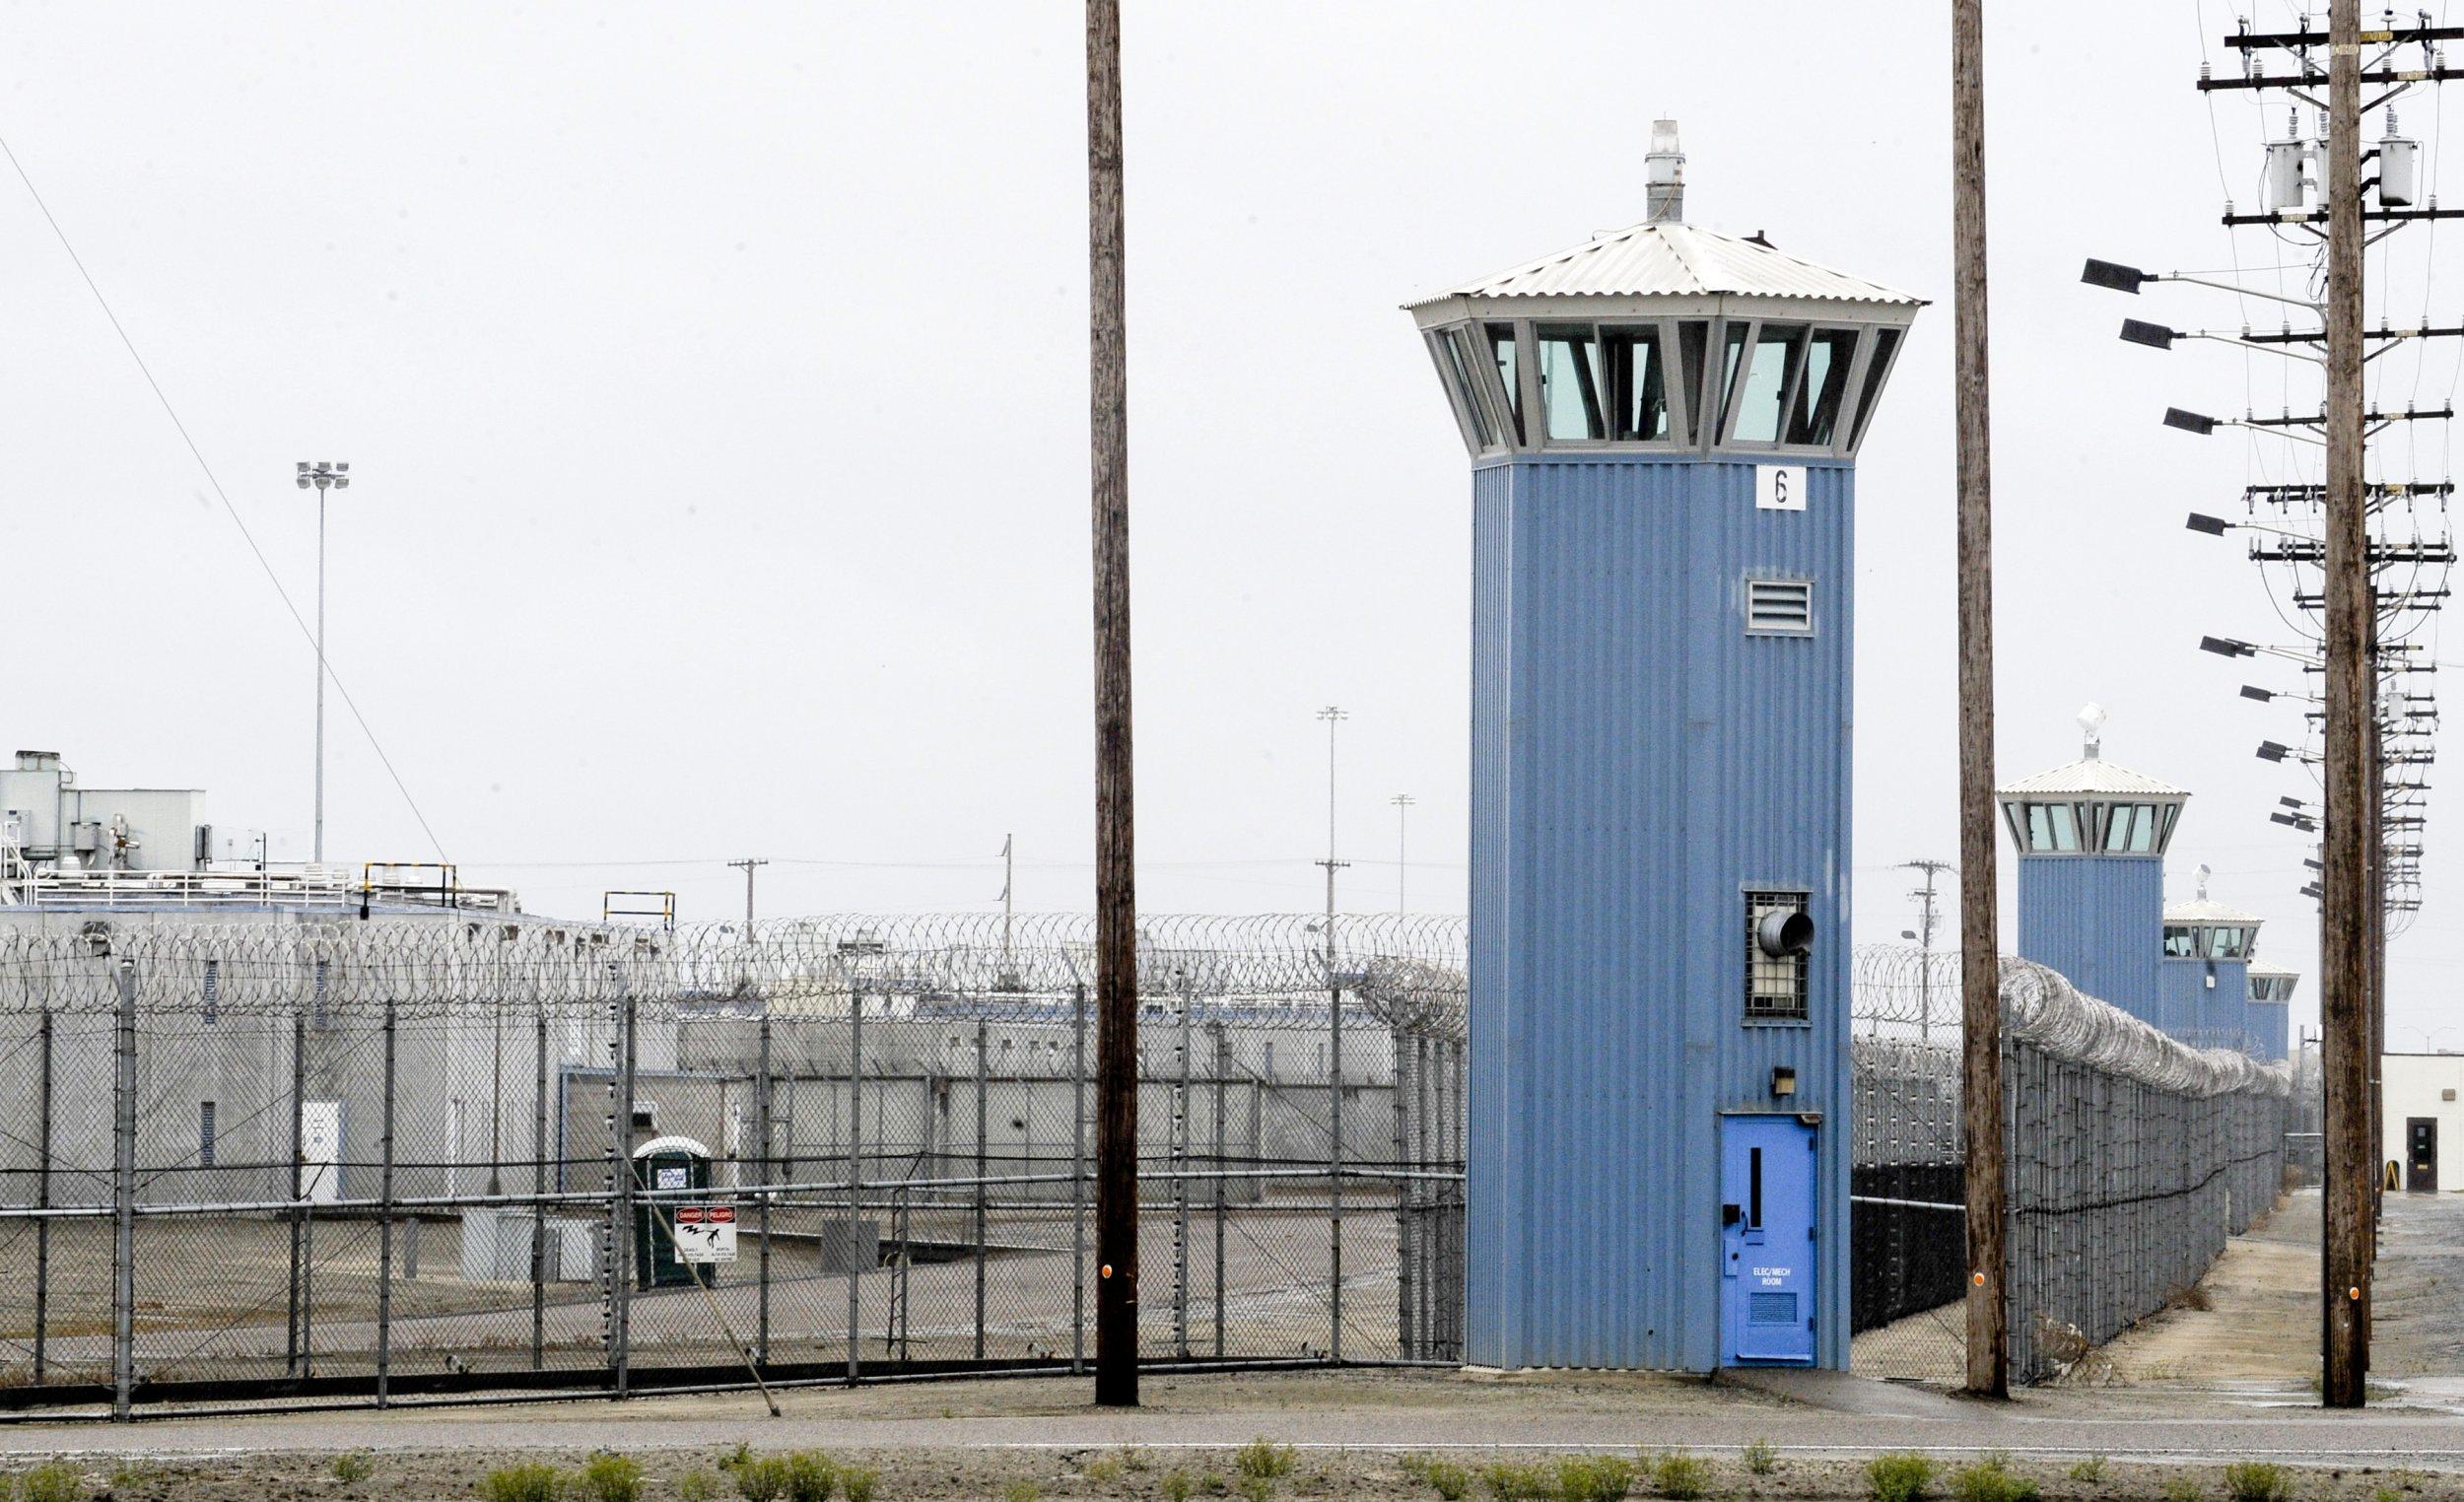 11_22_Charles_Manson_prison